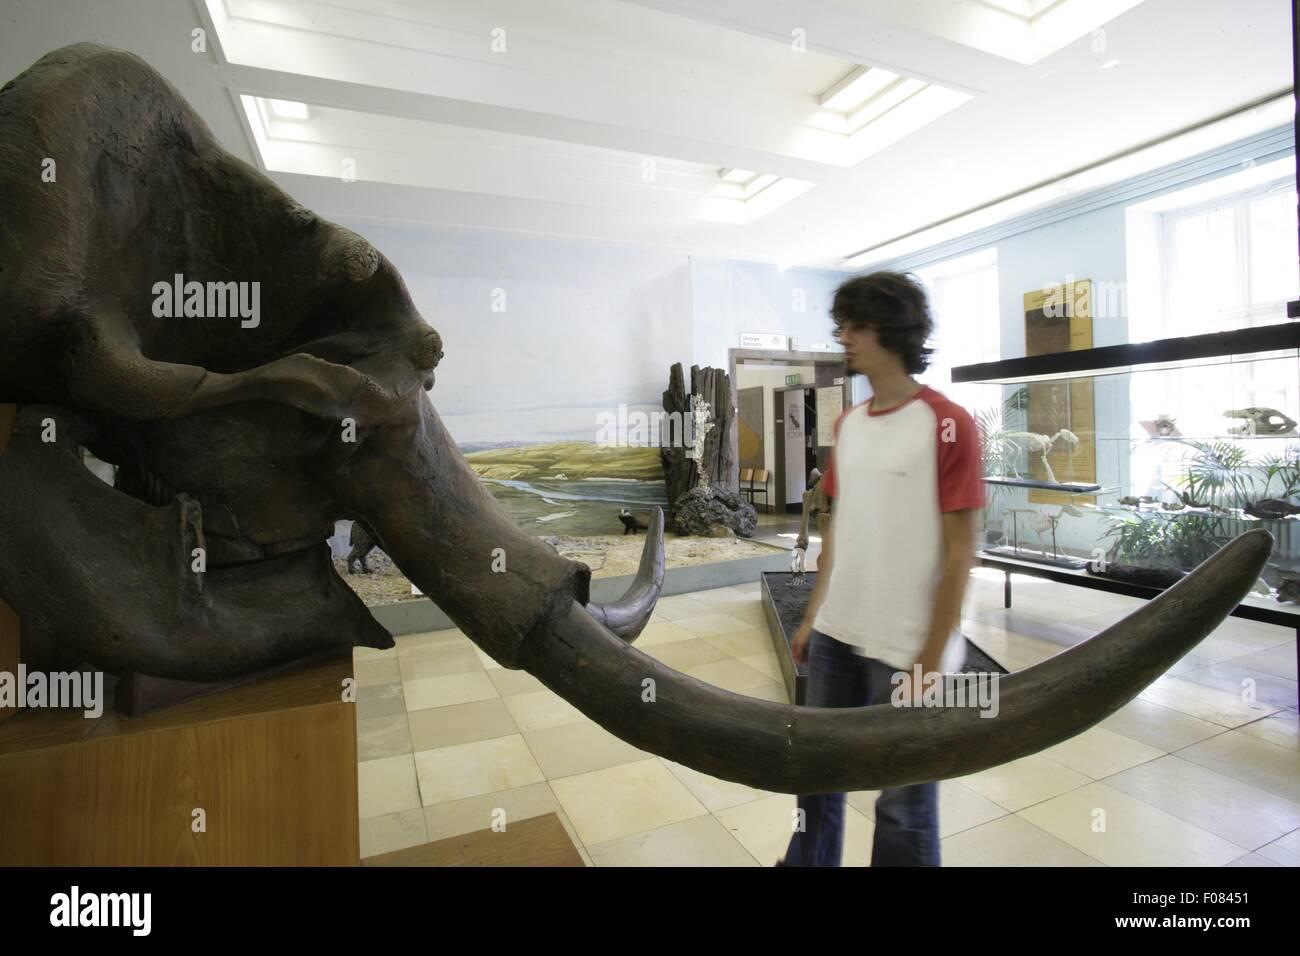 Hombre en Geological-Paleontological Museum, Hamburgo, Alemania. Imagen De Stock